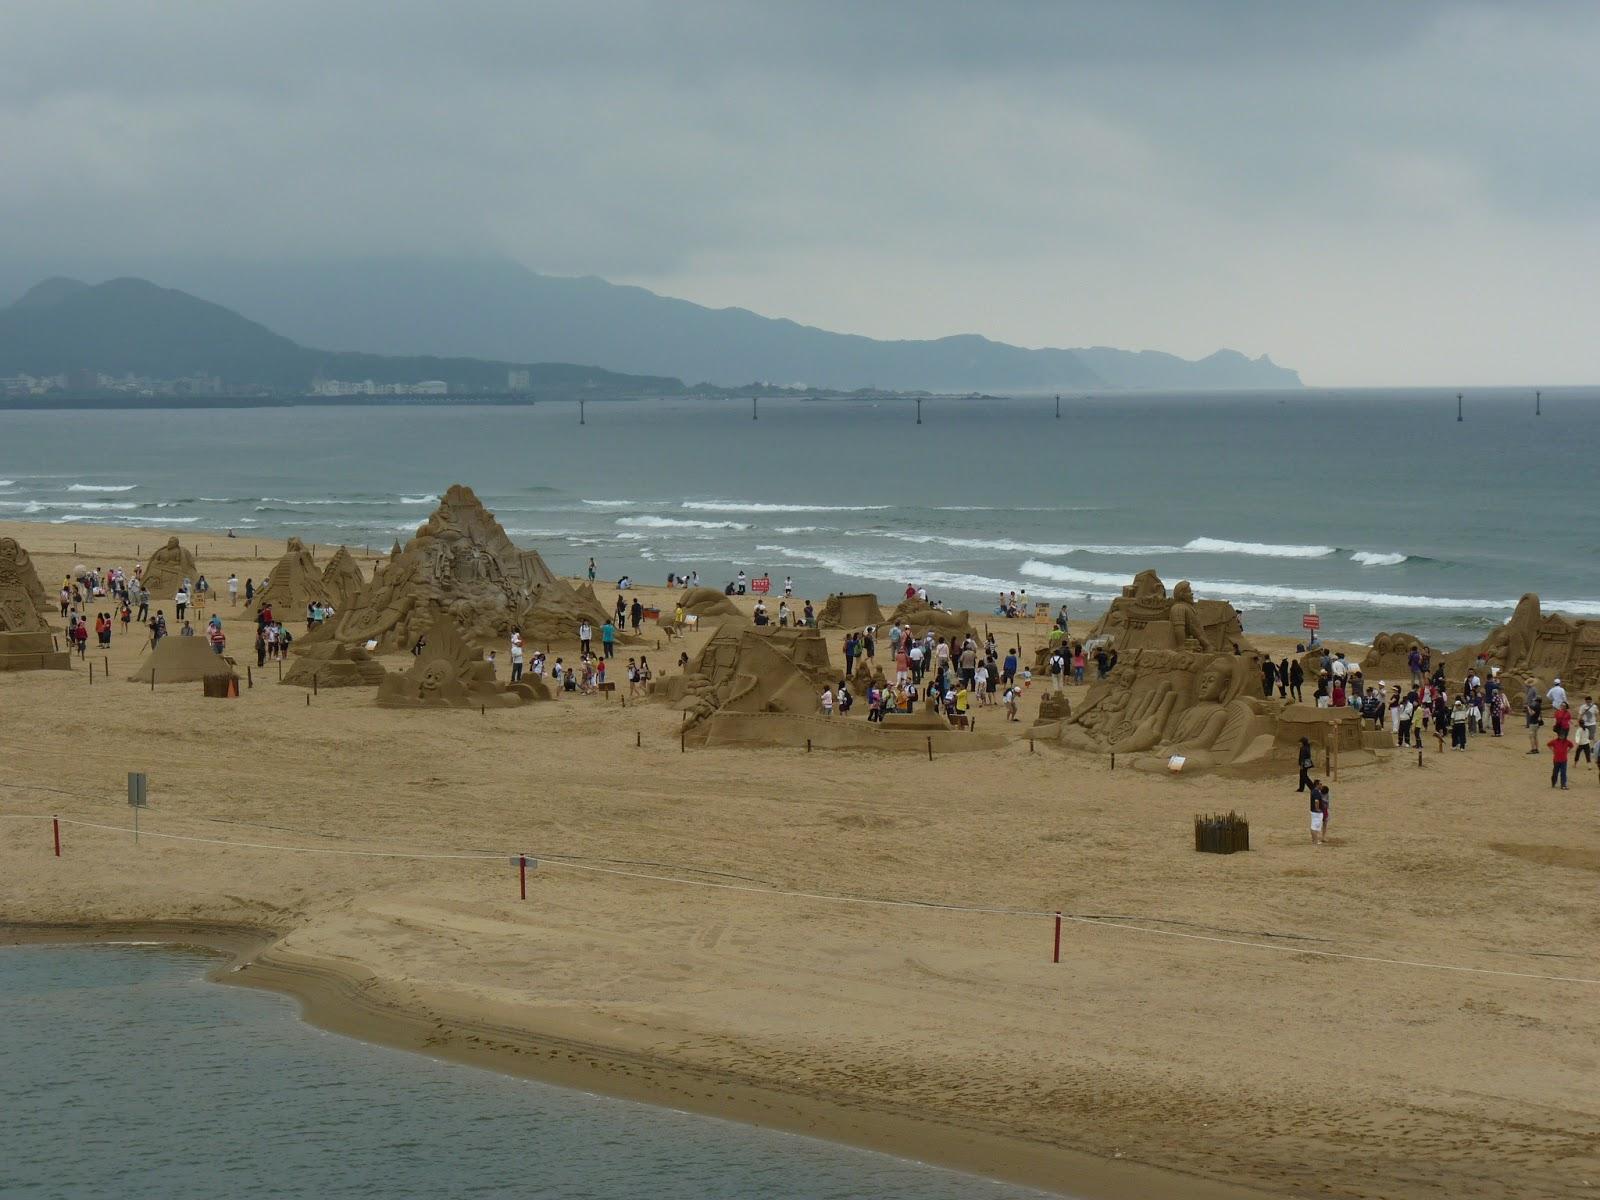 Fulong Beach 福隆海水浴場 - Foreigners in Taiwan - 外國人在臺灣